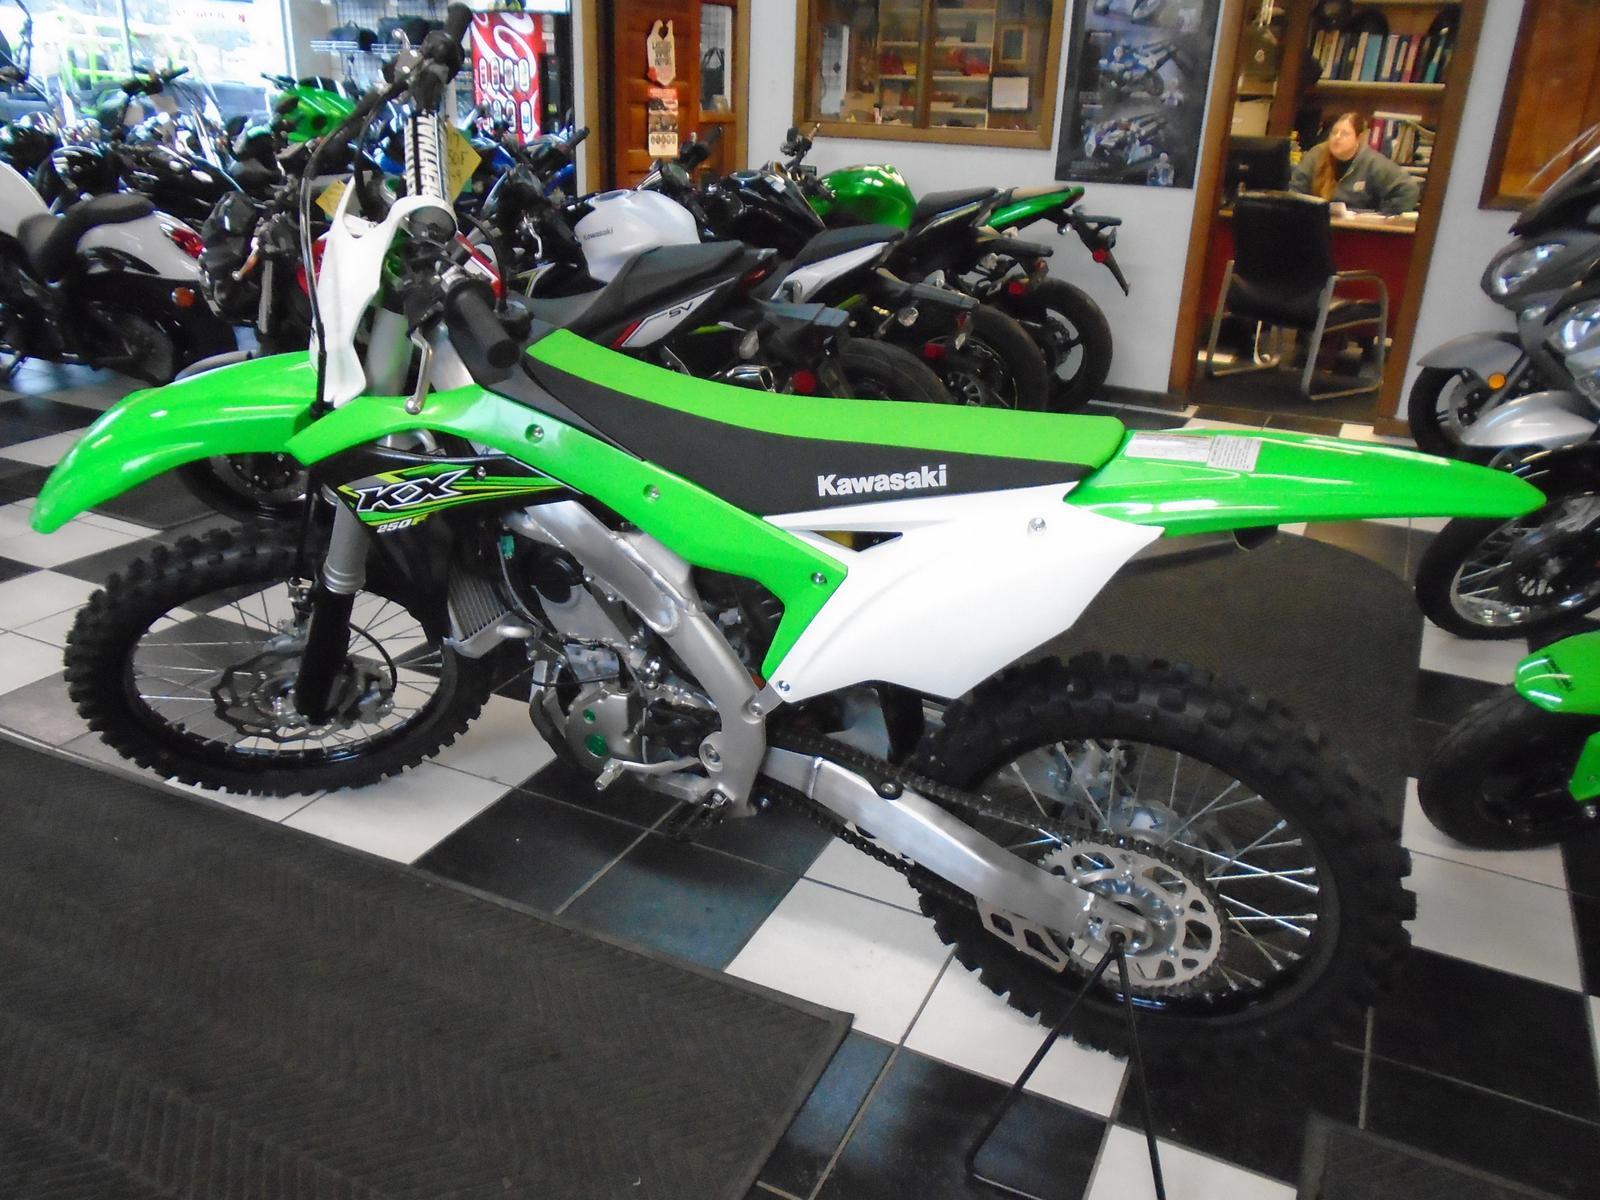 2017 Kawasaki KX™250F for sale in Bridgeport, WV | Leeson's